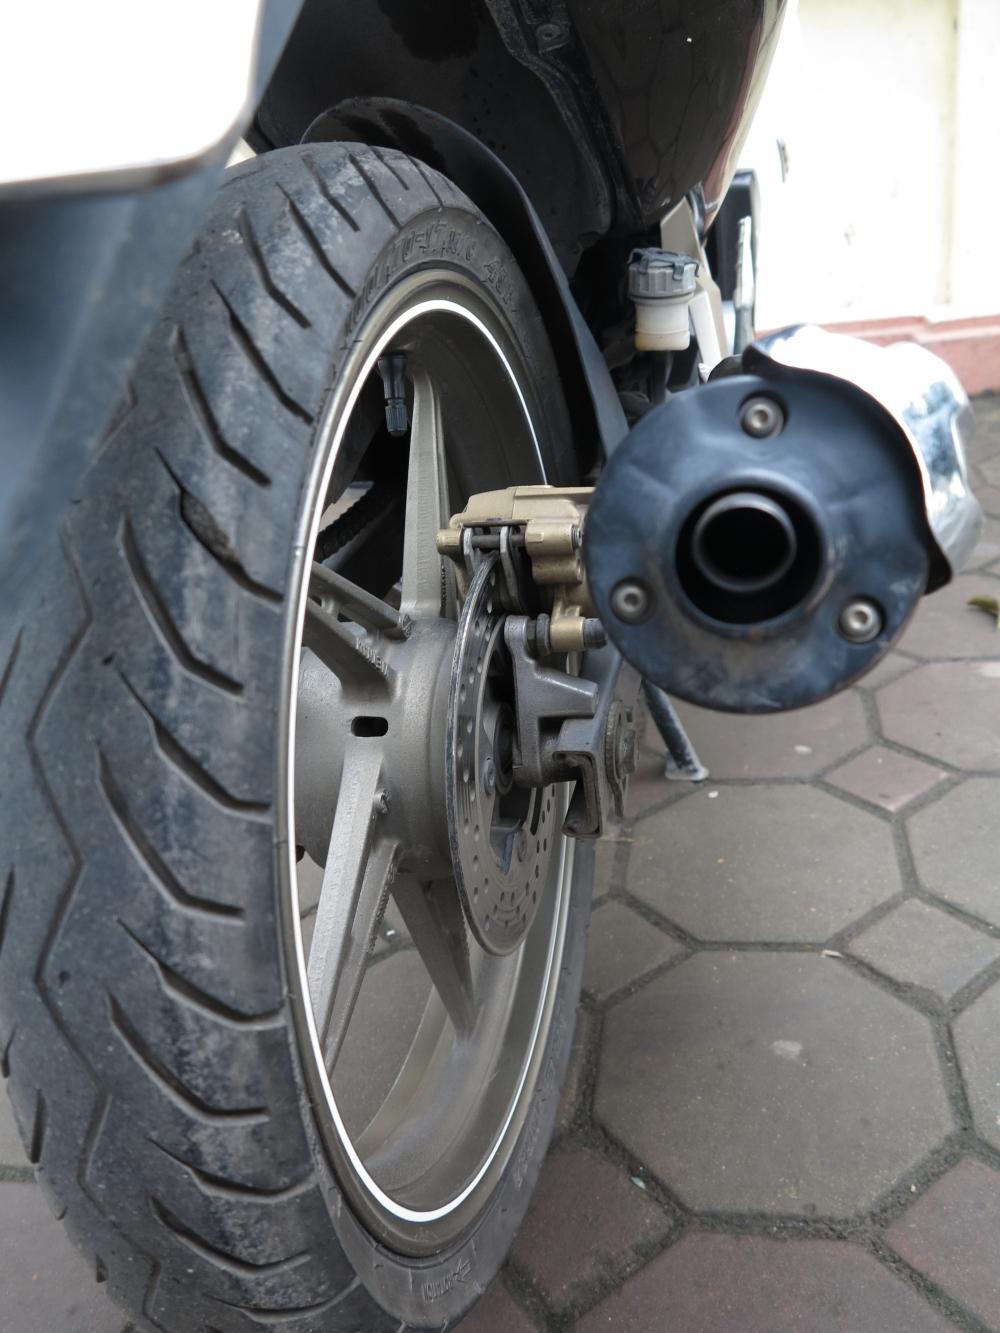 Ban Exciter 135cc con tay may khoe boc xe dep 245 trieu dong - 5